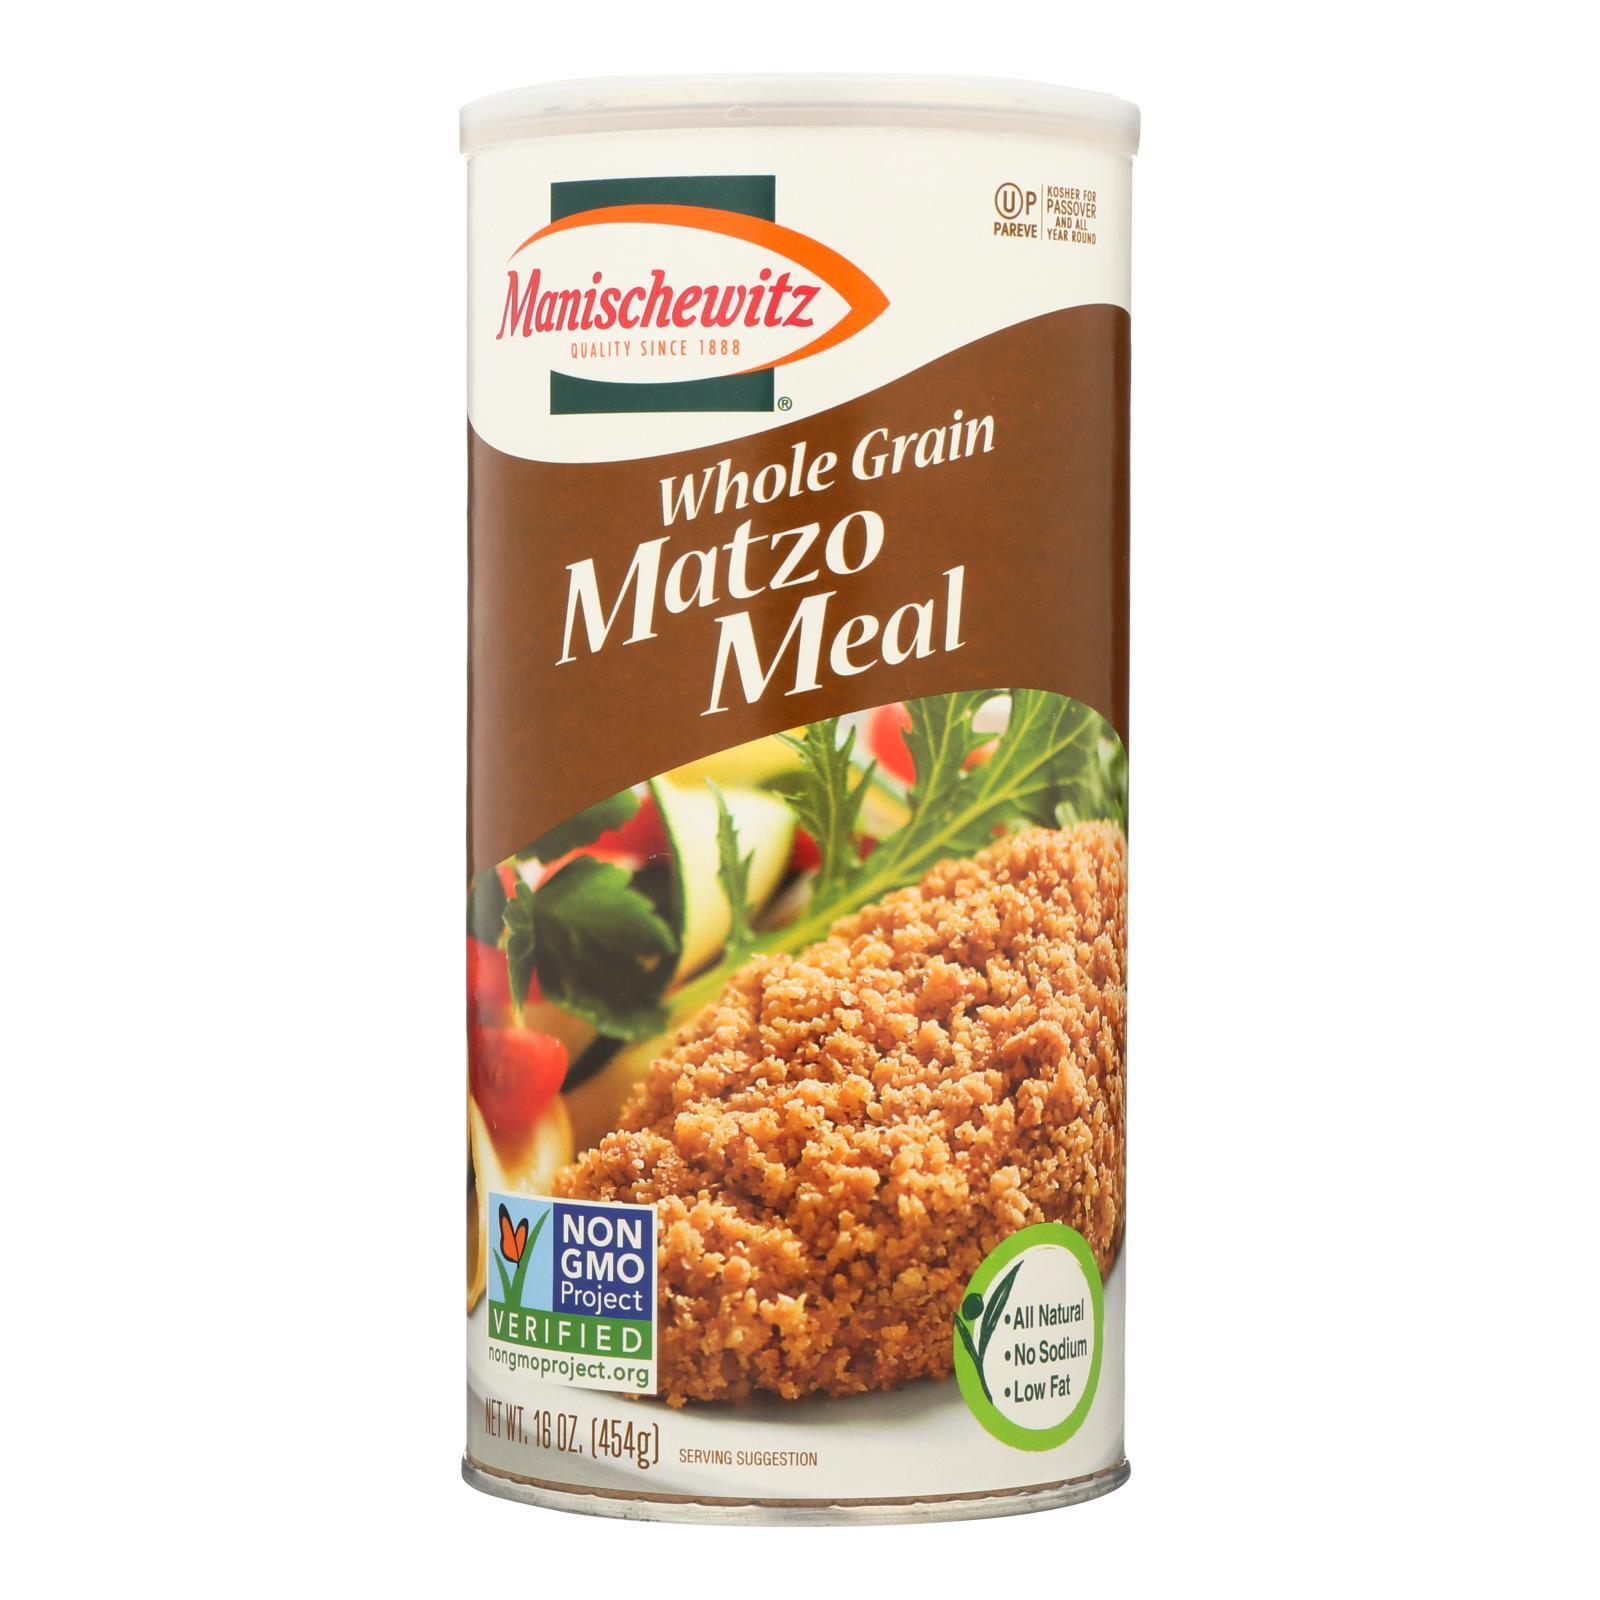 Manischewitz Whole Grain Matzo Meal - Case of 12 - 1 lb.